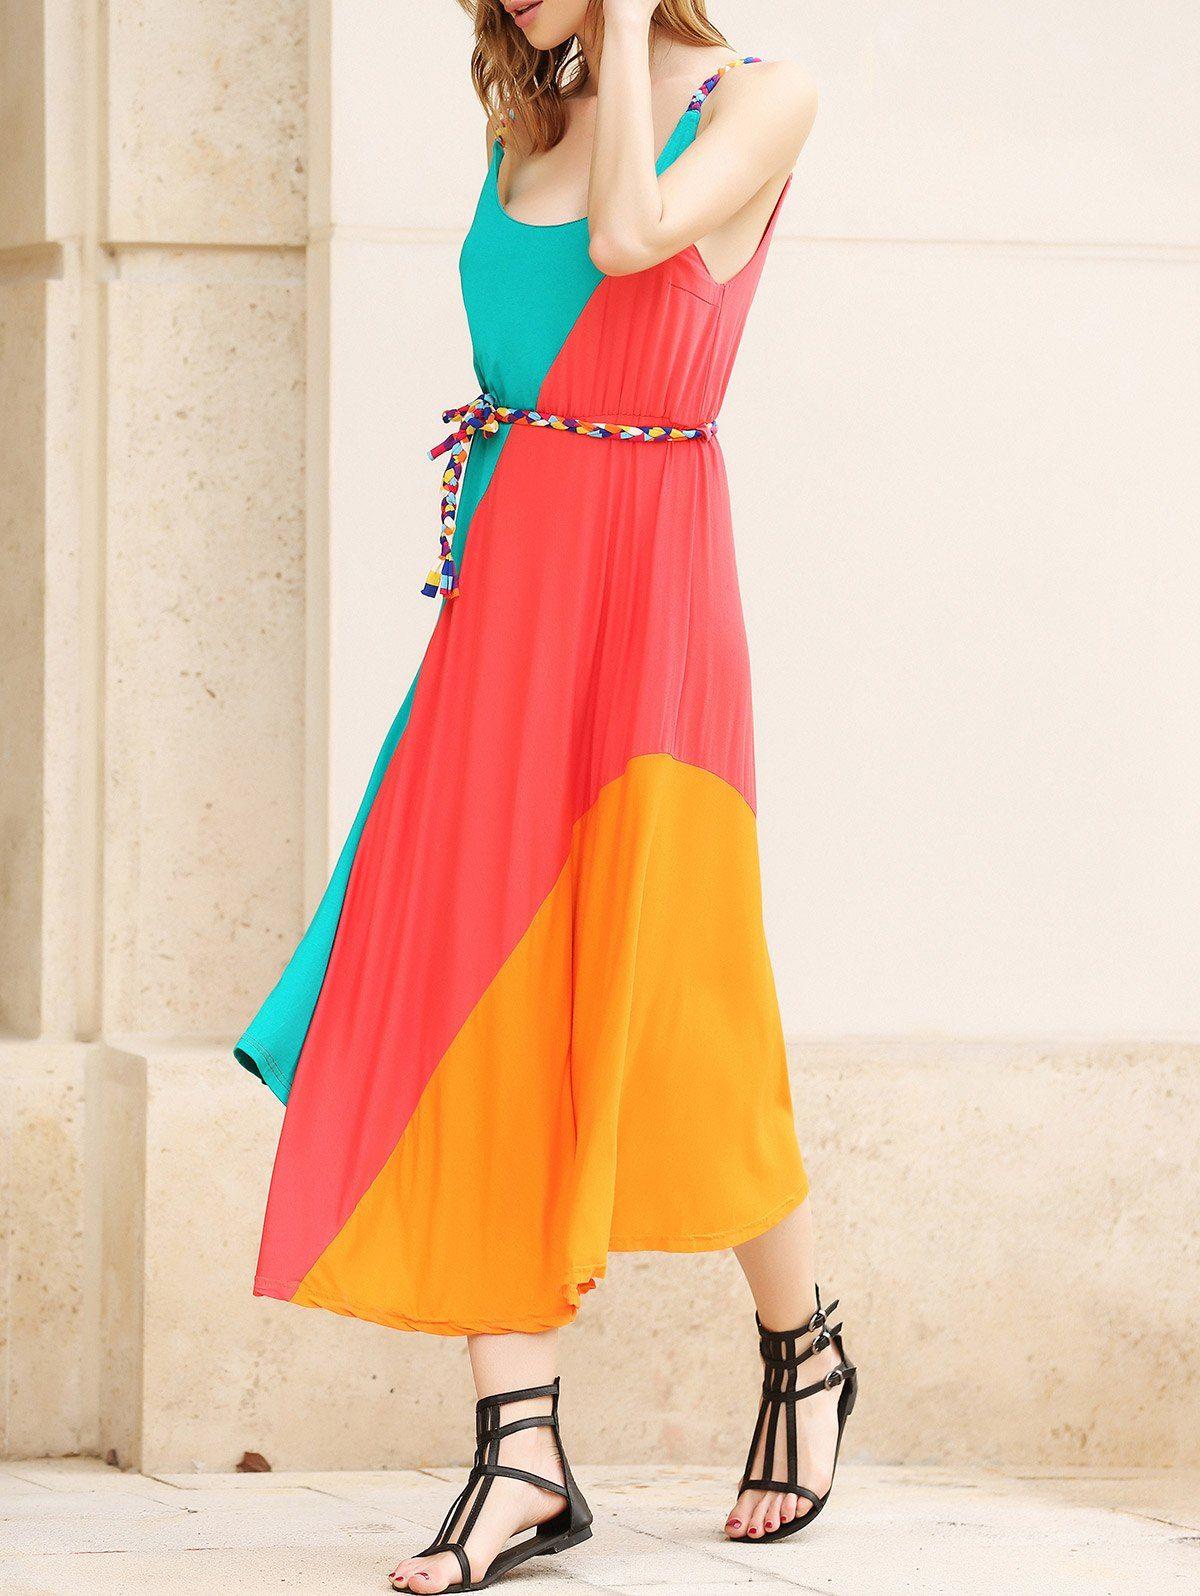 7aa209dbcb407 Gorgeous Womens Dress Summer Irregular Sleeveless Bohemian Party ...